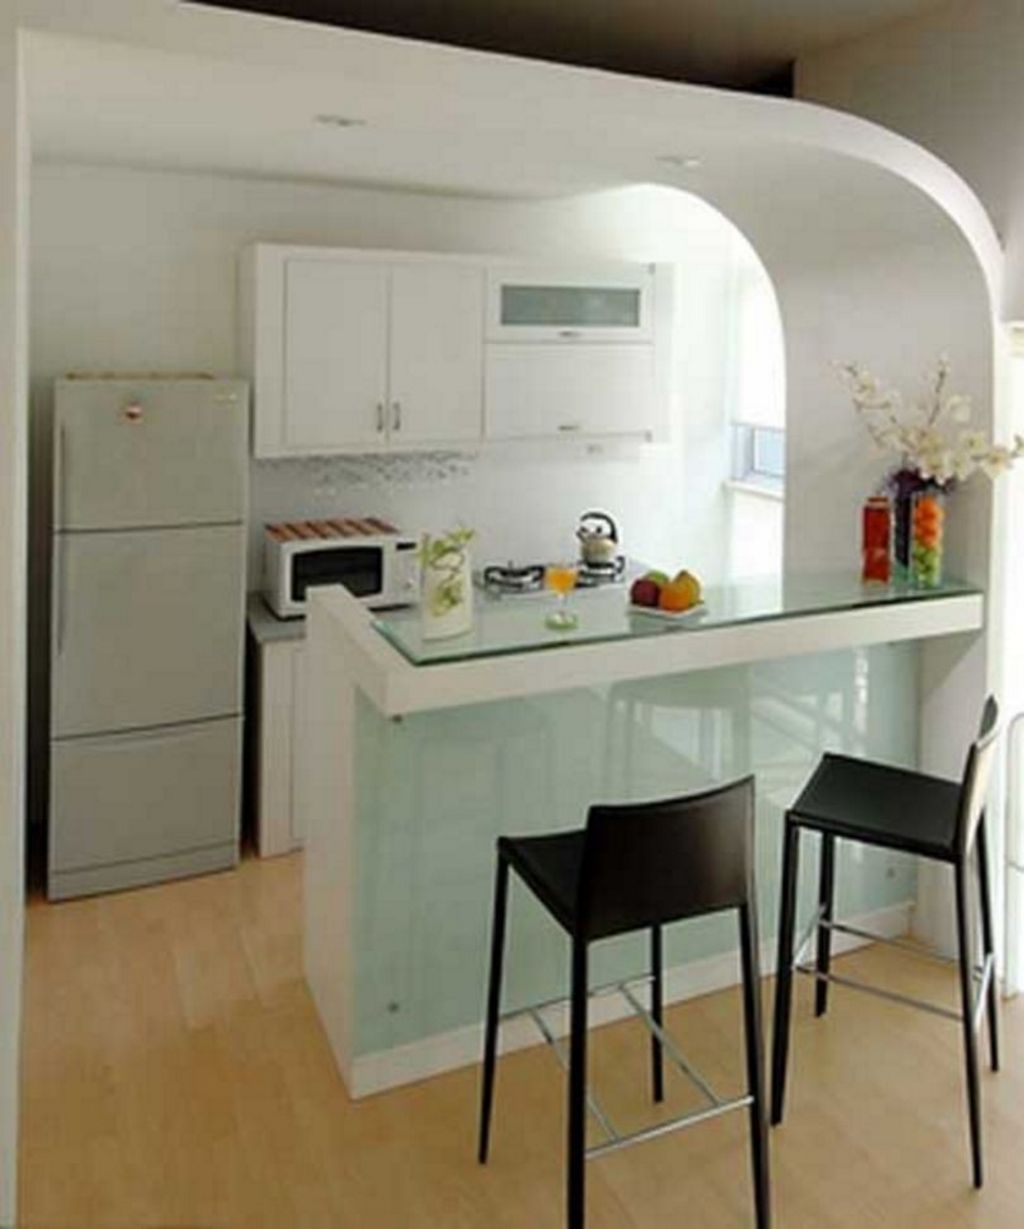 Desain Dapur Dengan Mini Bar In 2020 Kitchen Sets Kitchen